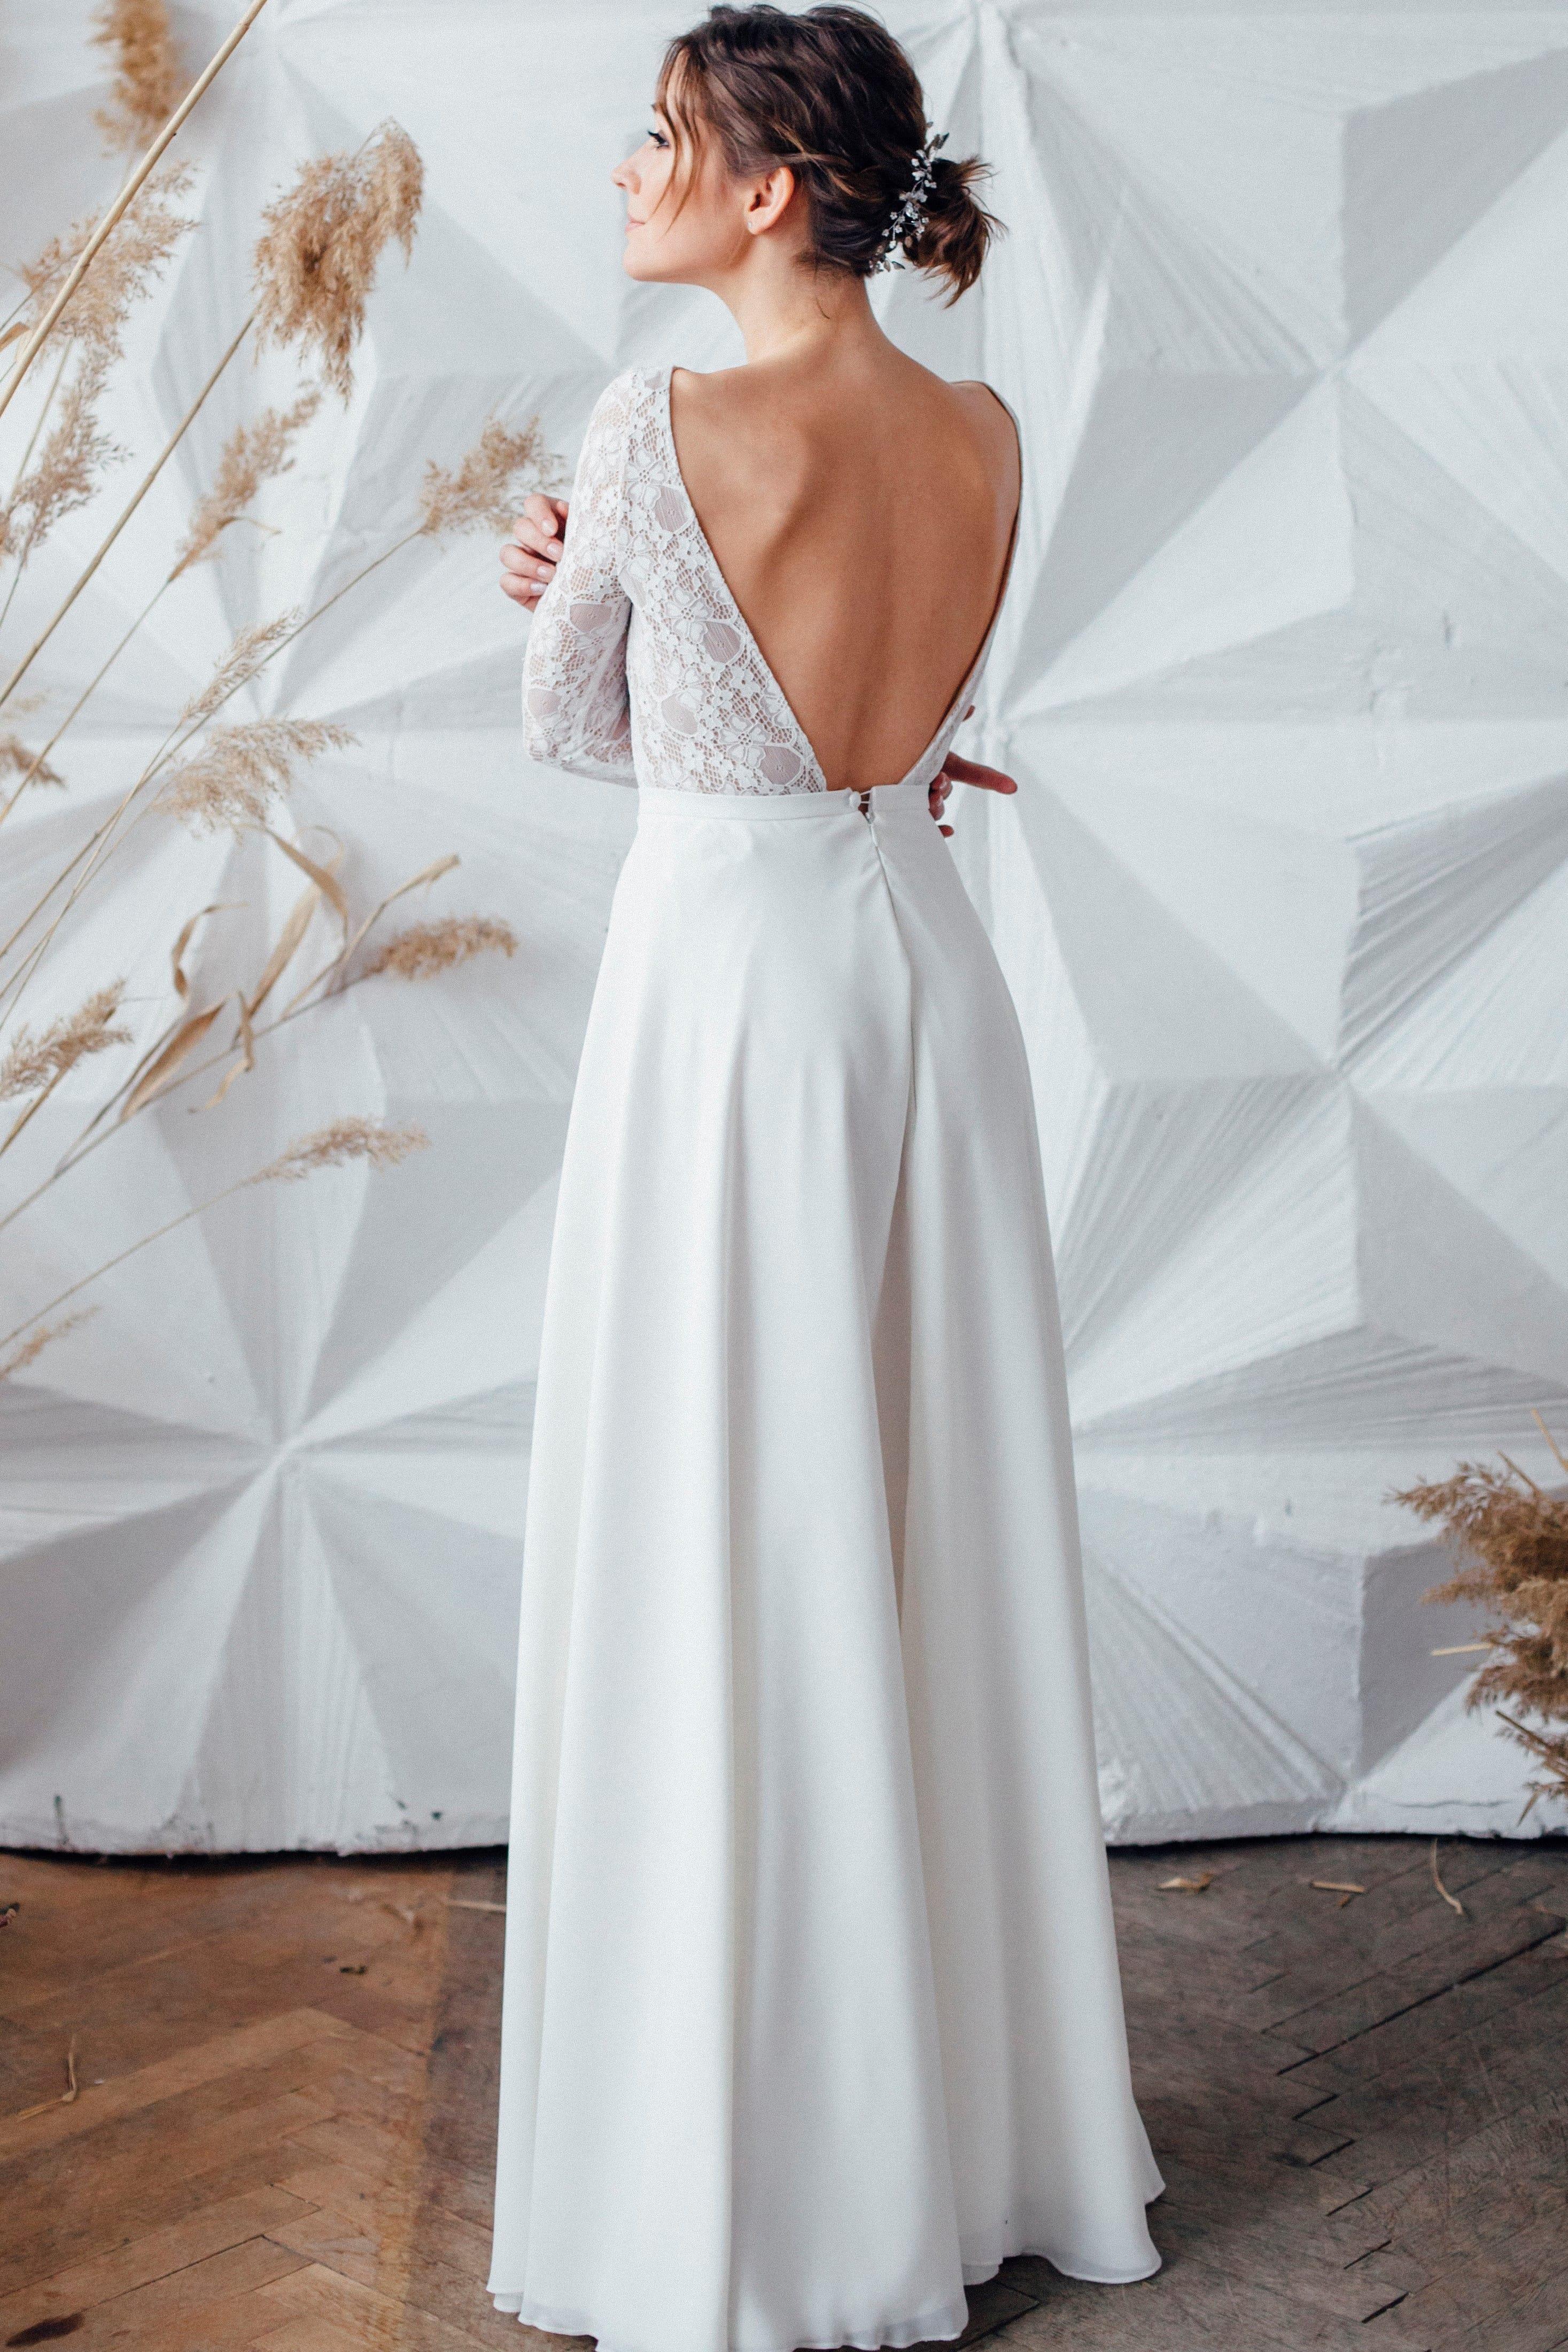 Свадебное платье NOVELLA, коллекция MAGIC OF TENDERNESS, бренд LORA SONG, фото 4